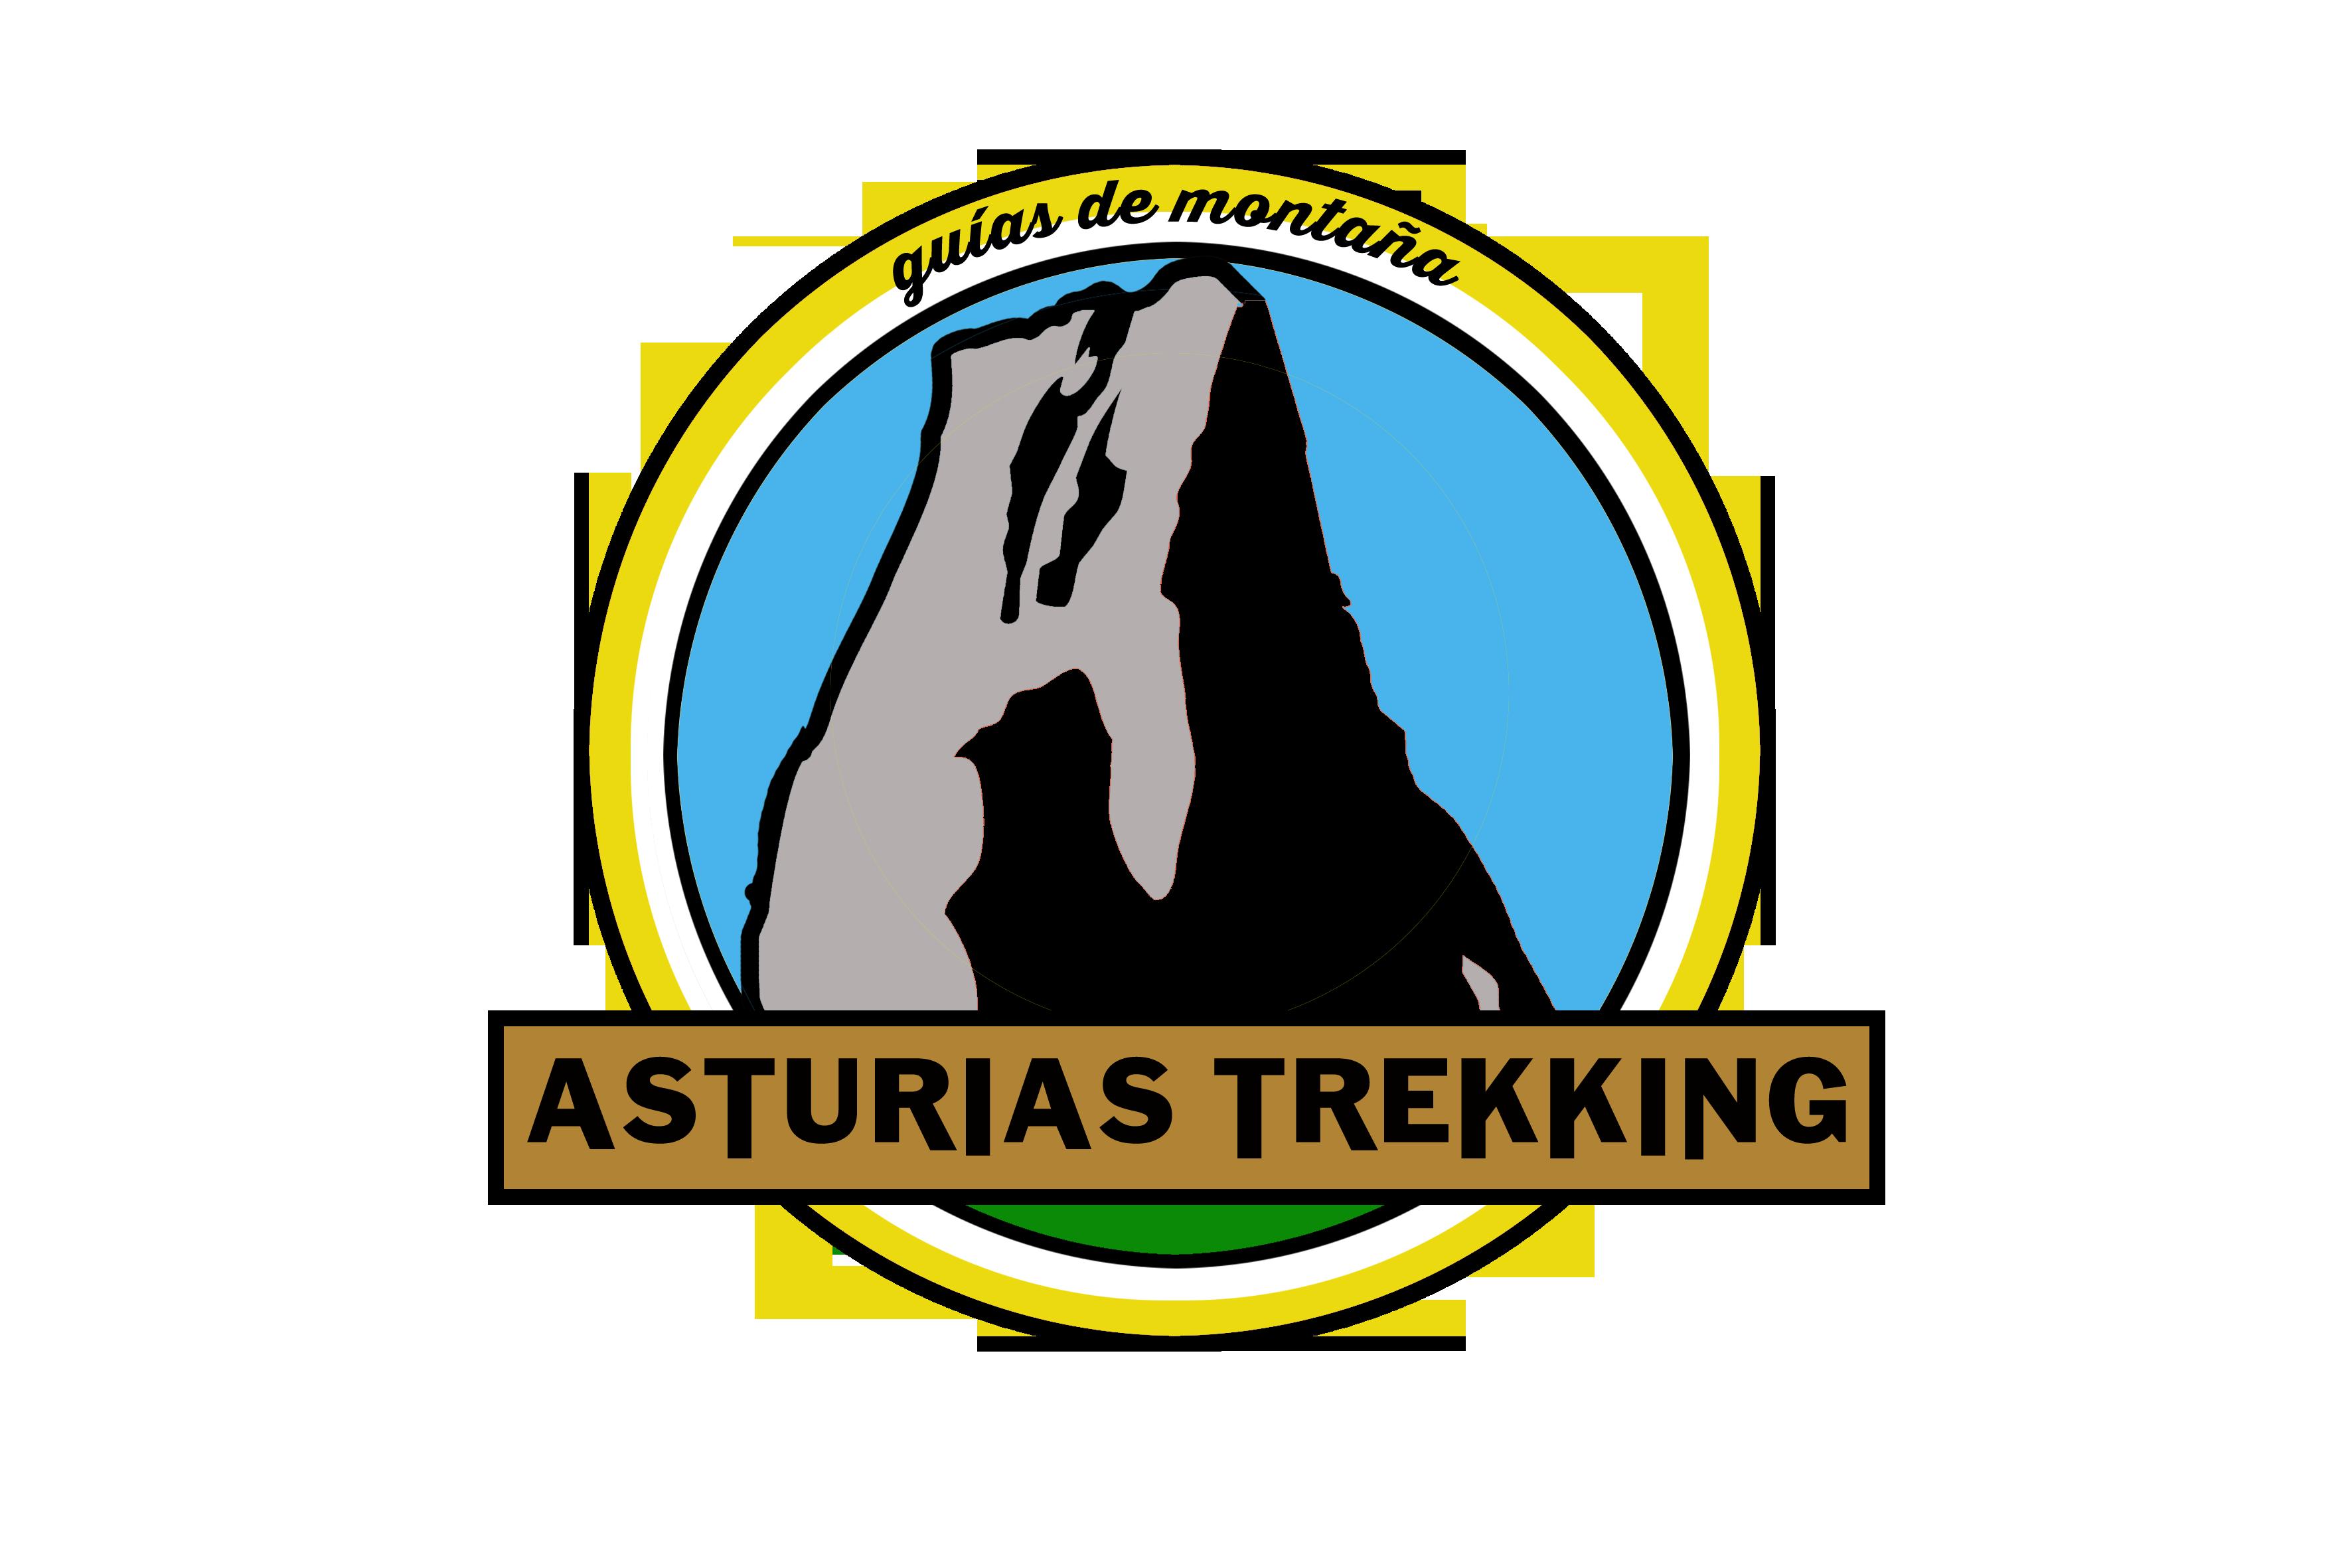 Logo asturias trekking trans